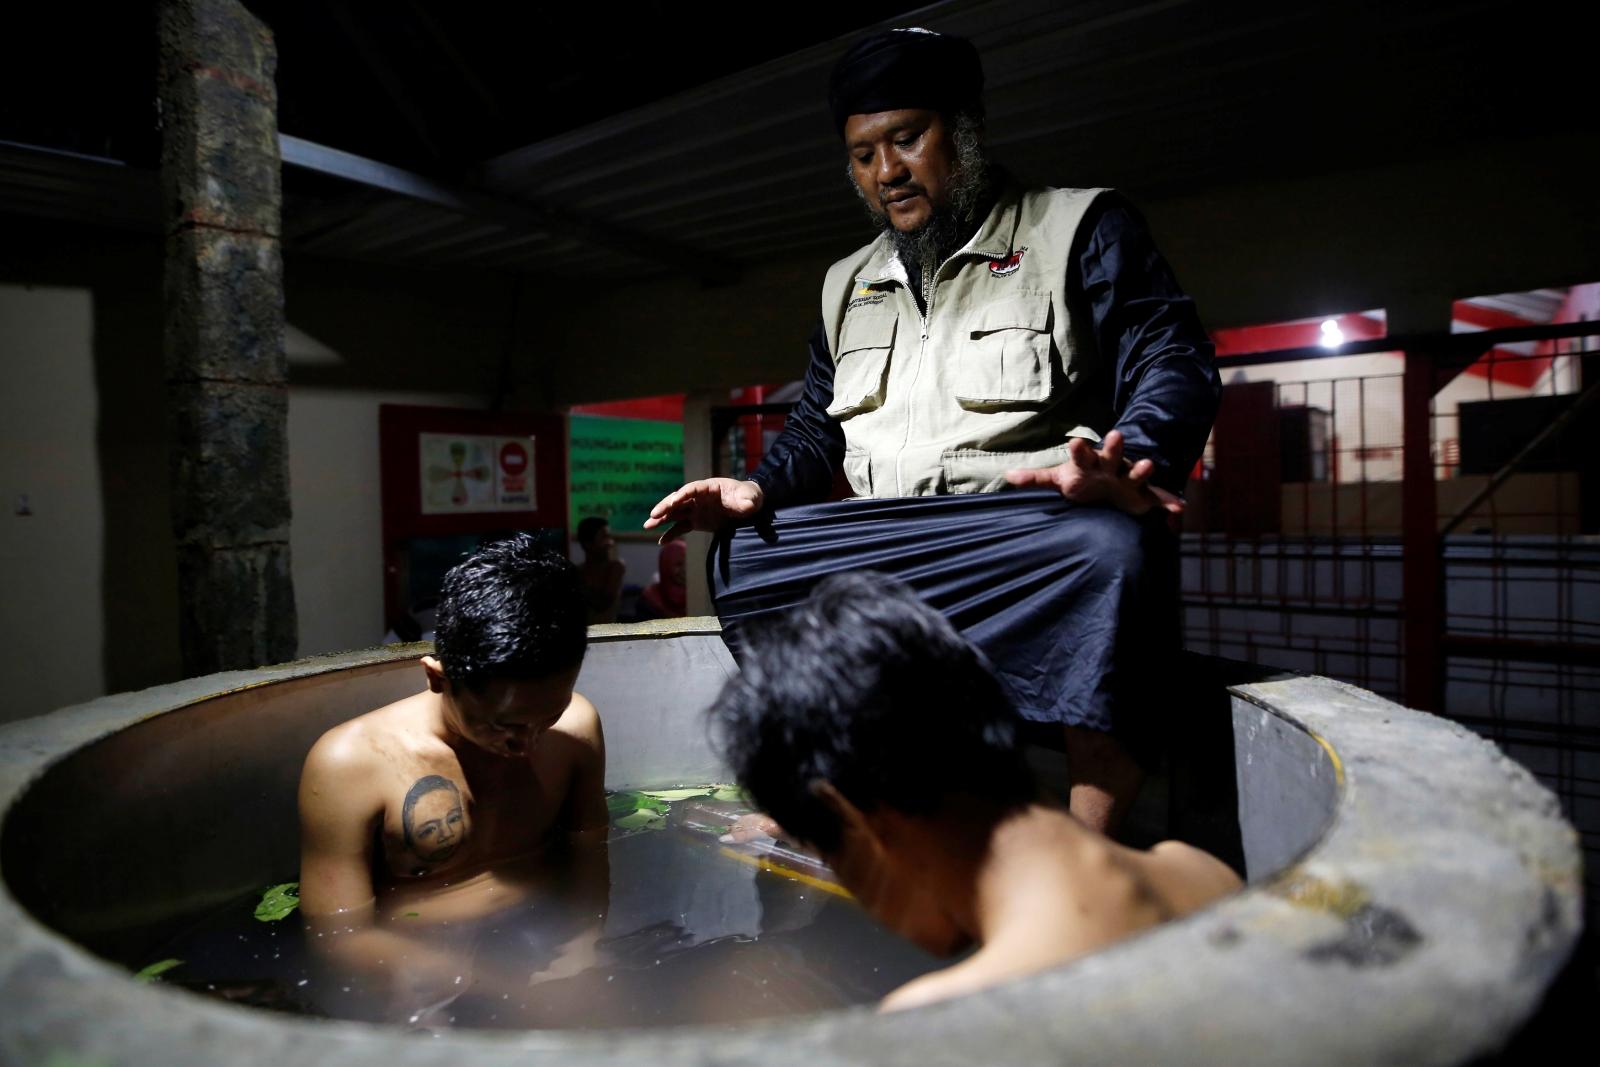 Indonesia drug rehabilitation